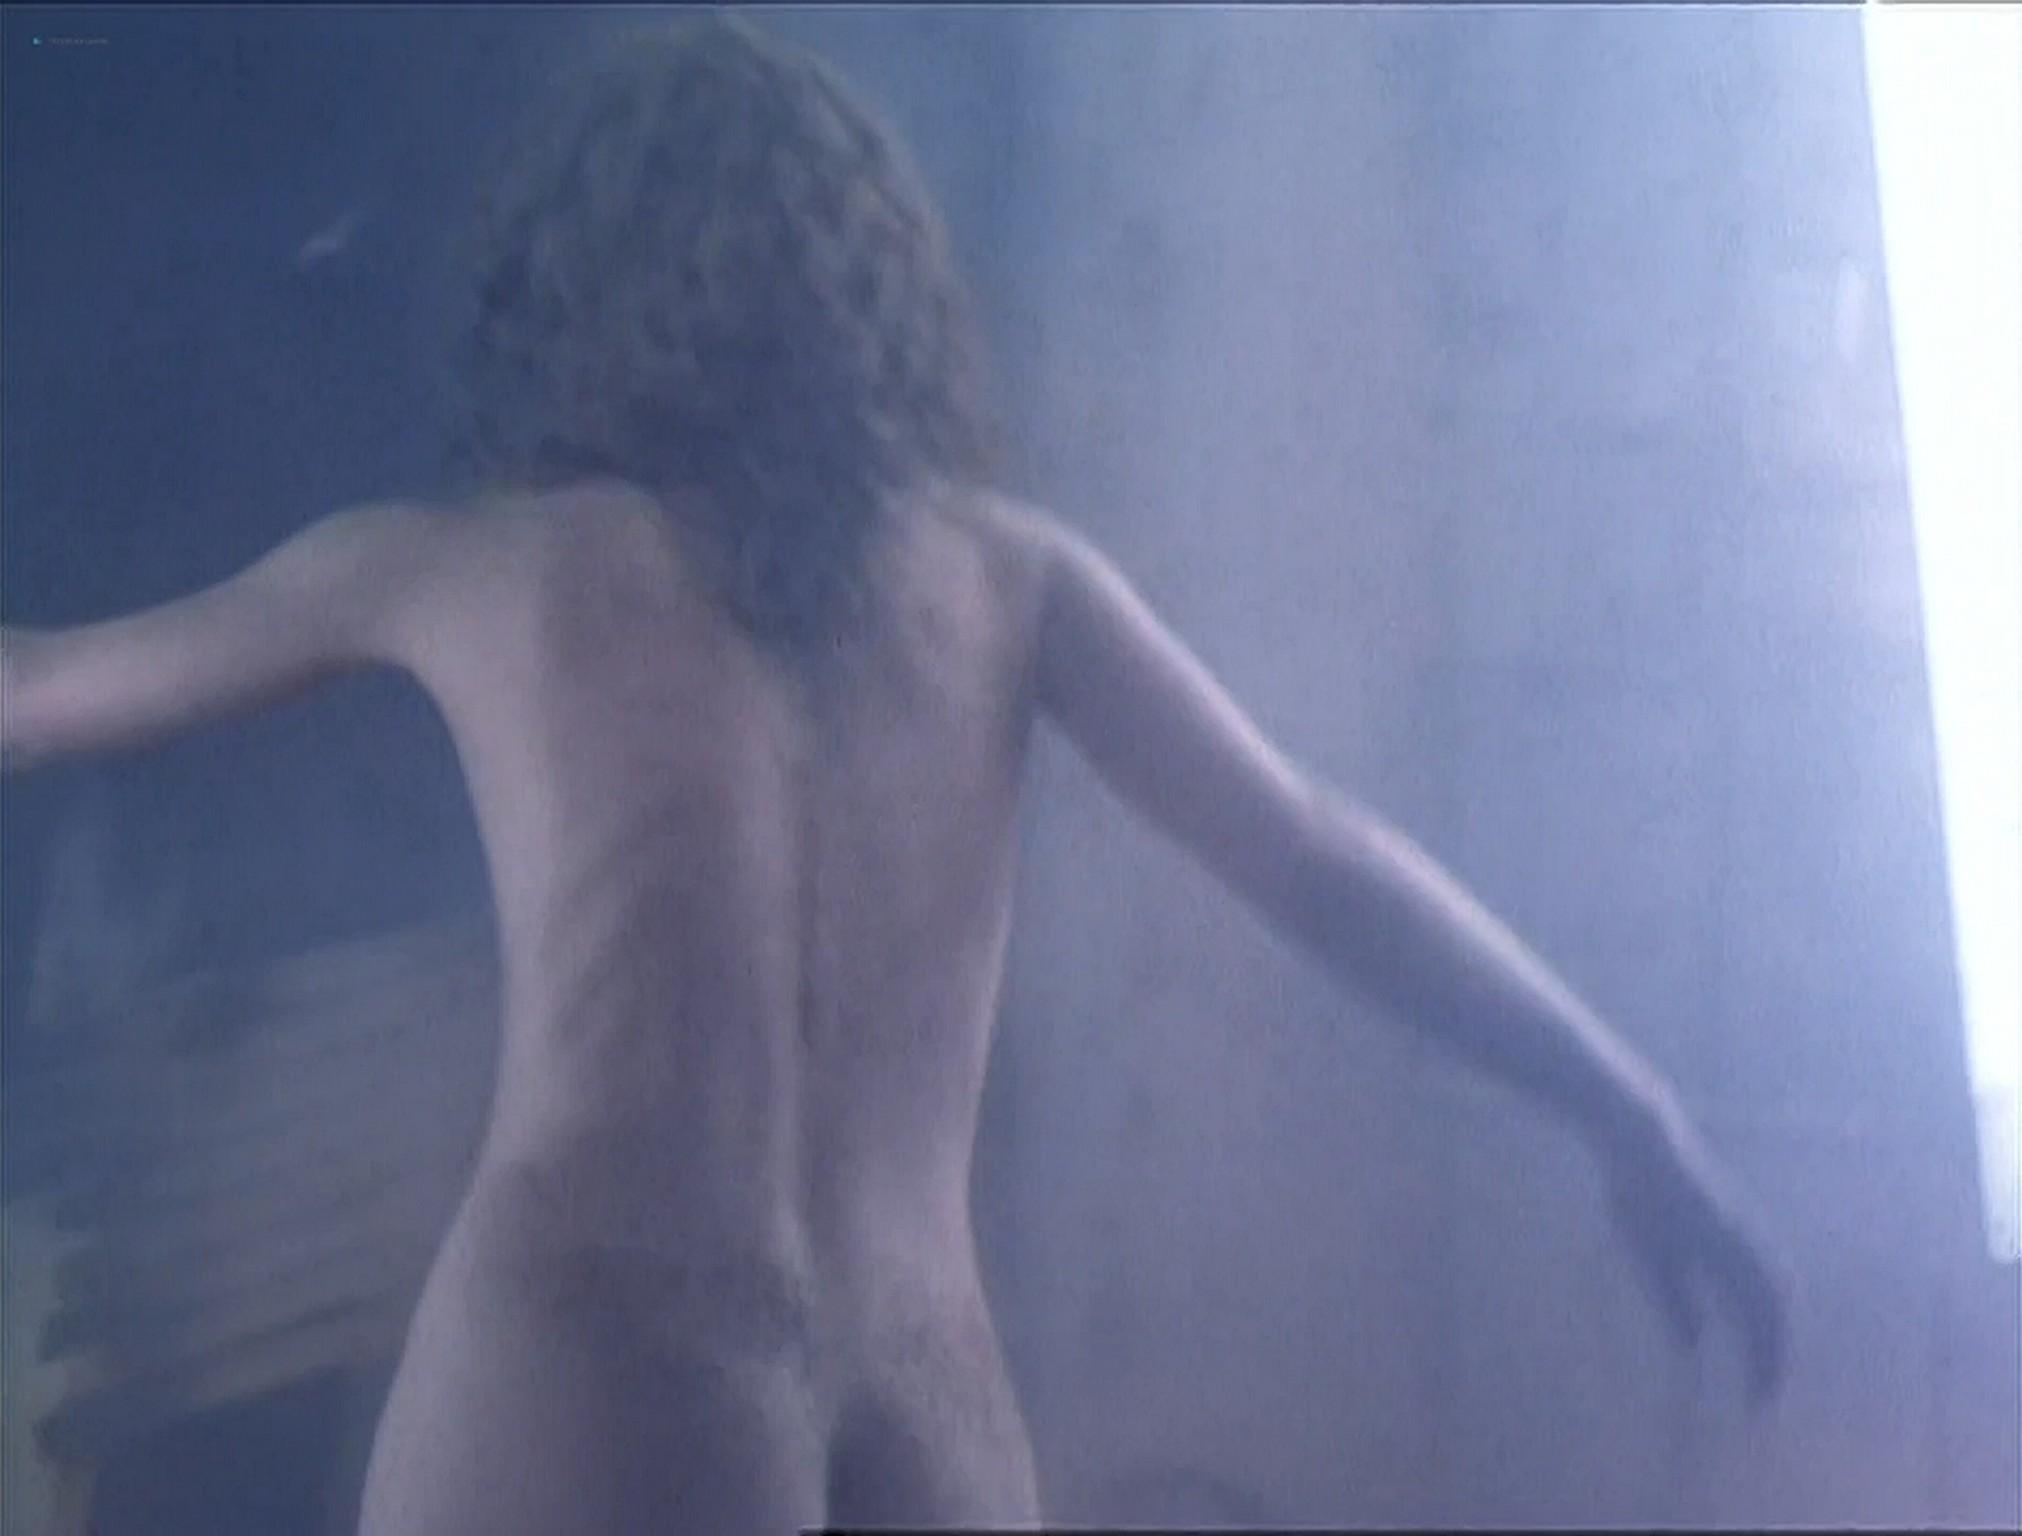 Christina Cox nude bush lesbian sex with Karyn Dwyer nude too Better than Chocolate 1999 HD 720p WEB DL 15